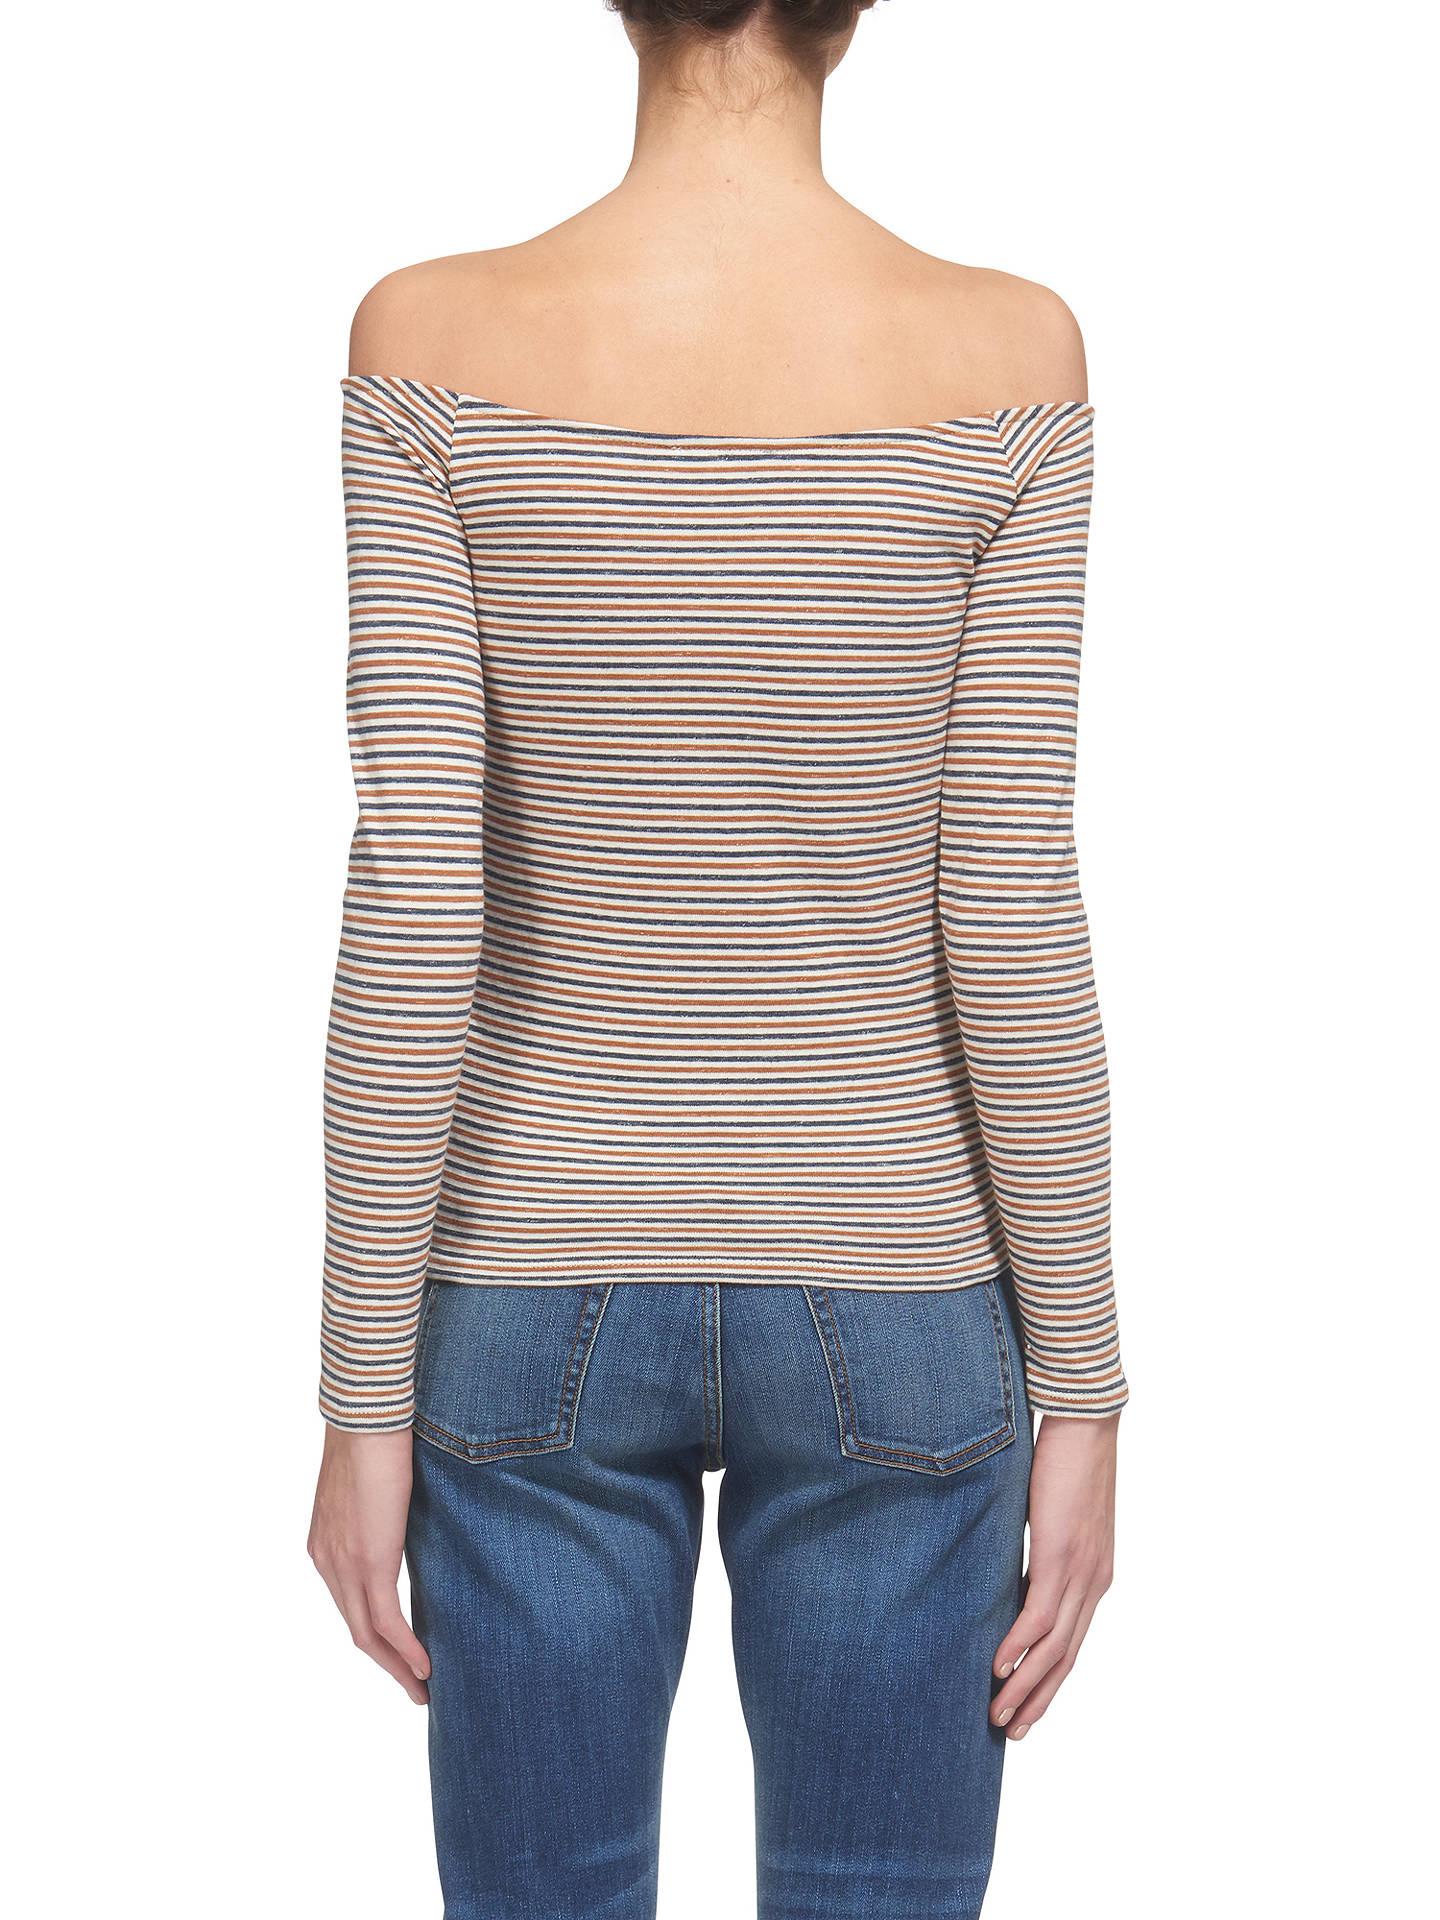 5ced356d68887 ... Buy Whistles Stripe Cotton Bardot Top